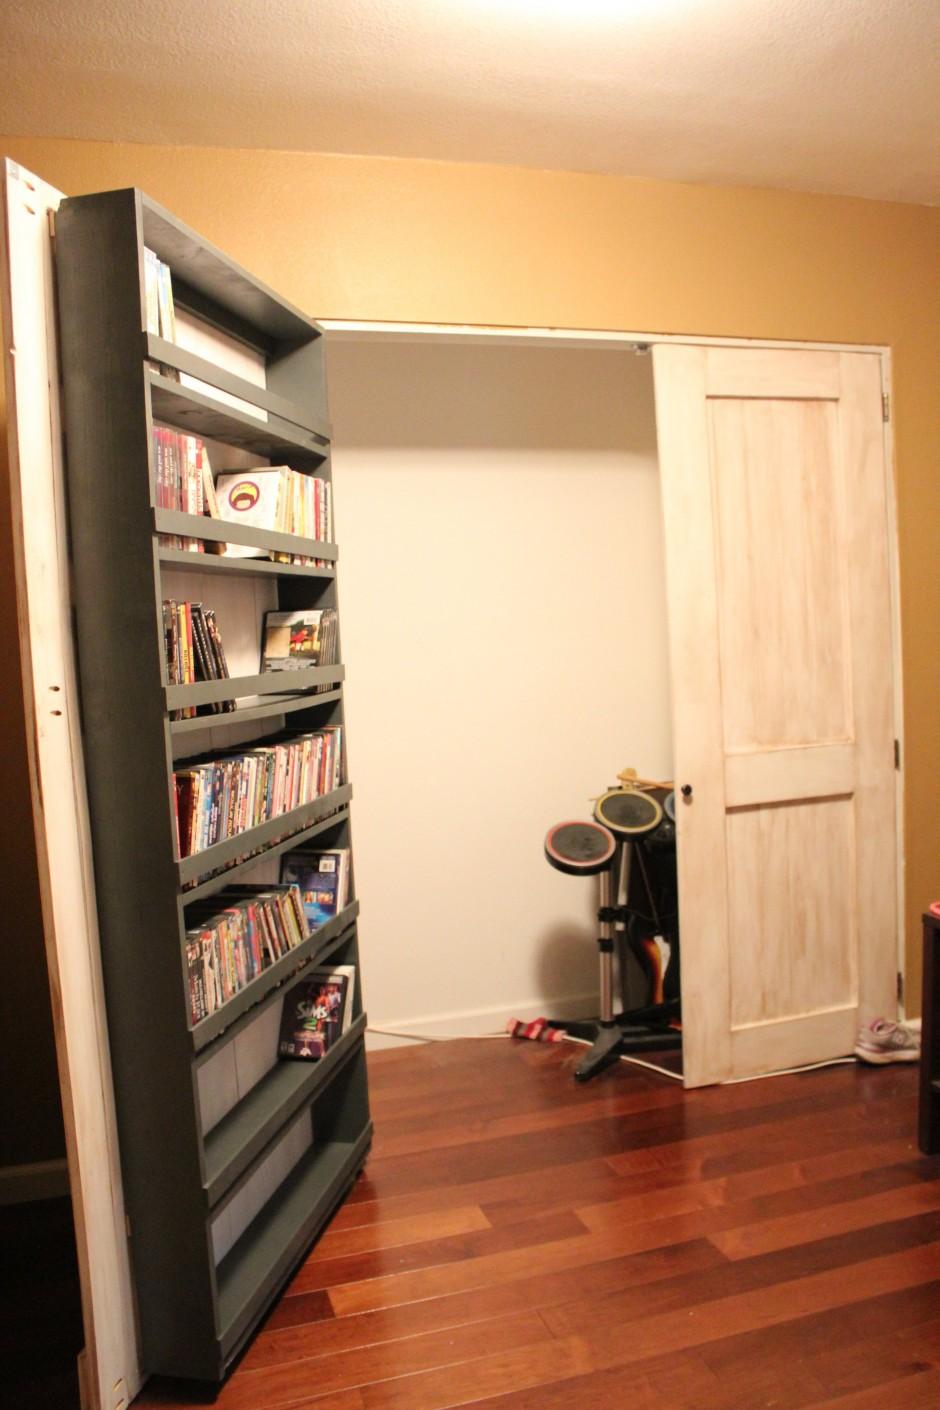 Kmart Bookshelves | Kmart Kids Beds | Kmart Ps4